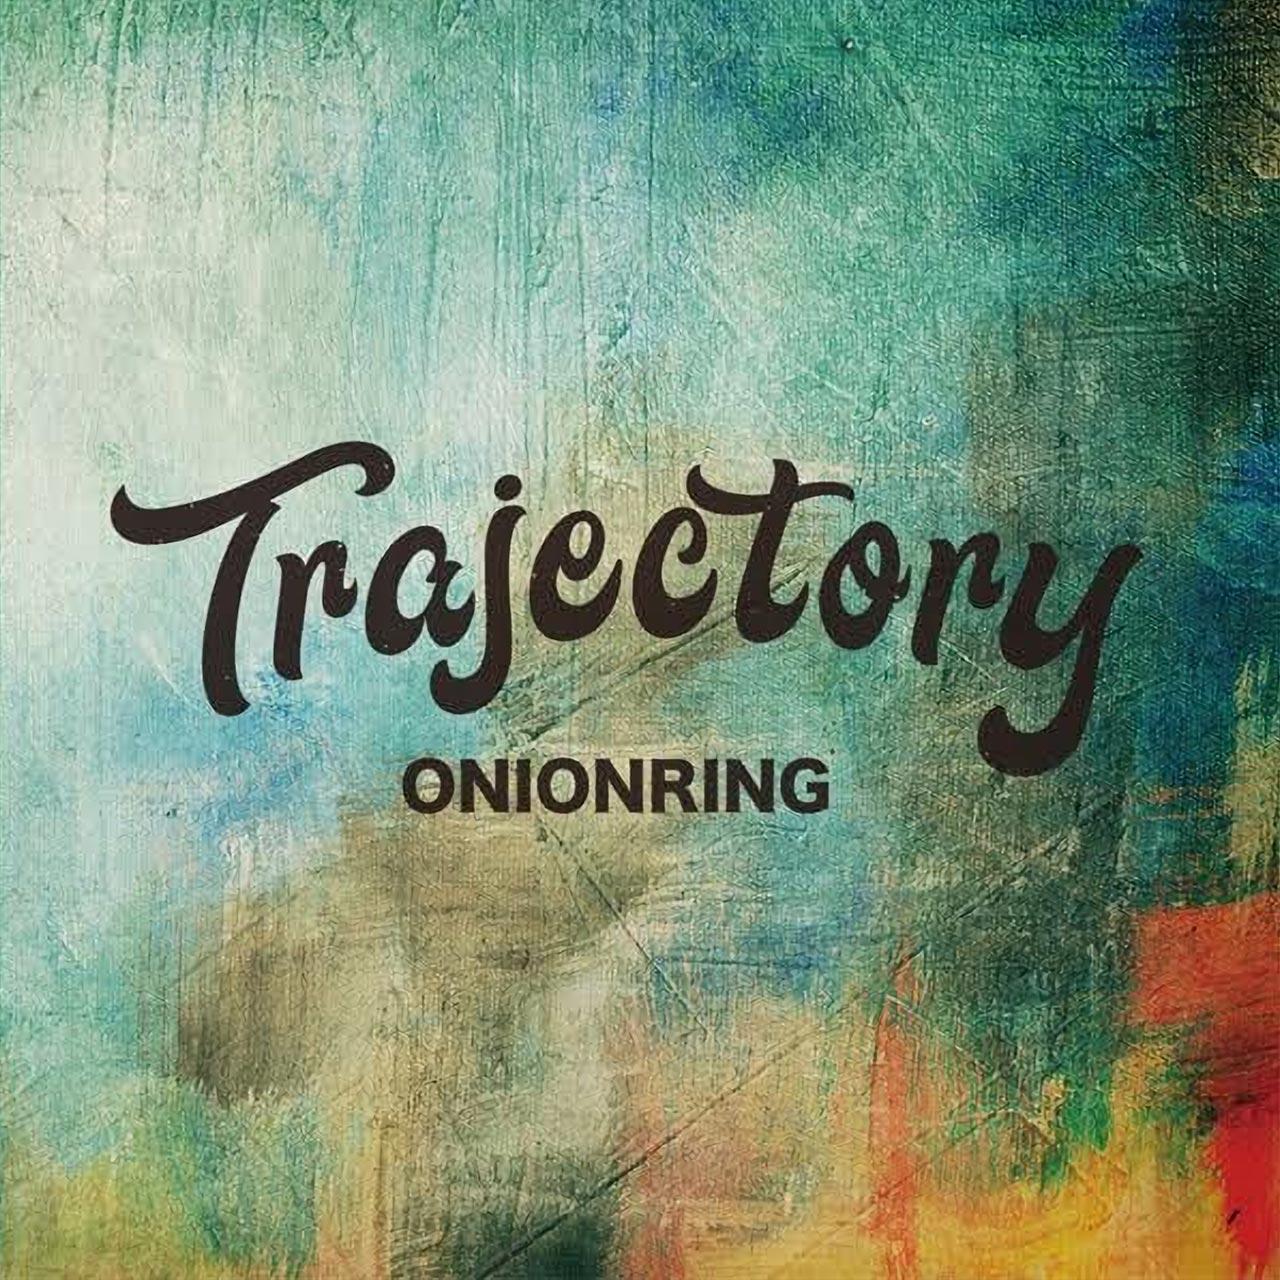 ONIONRING Trajectory